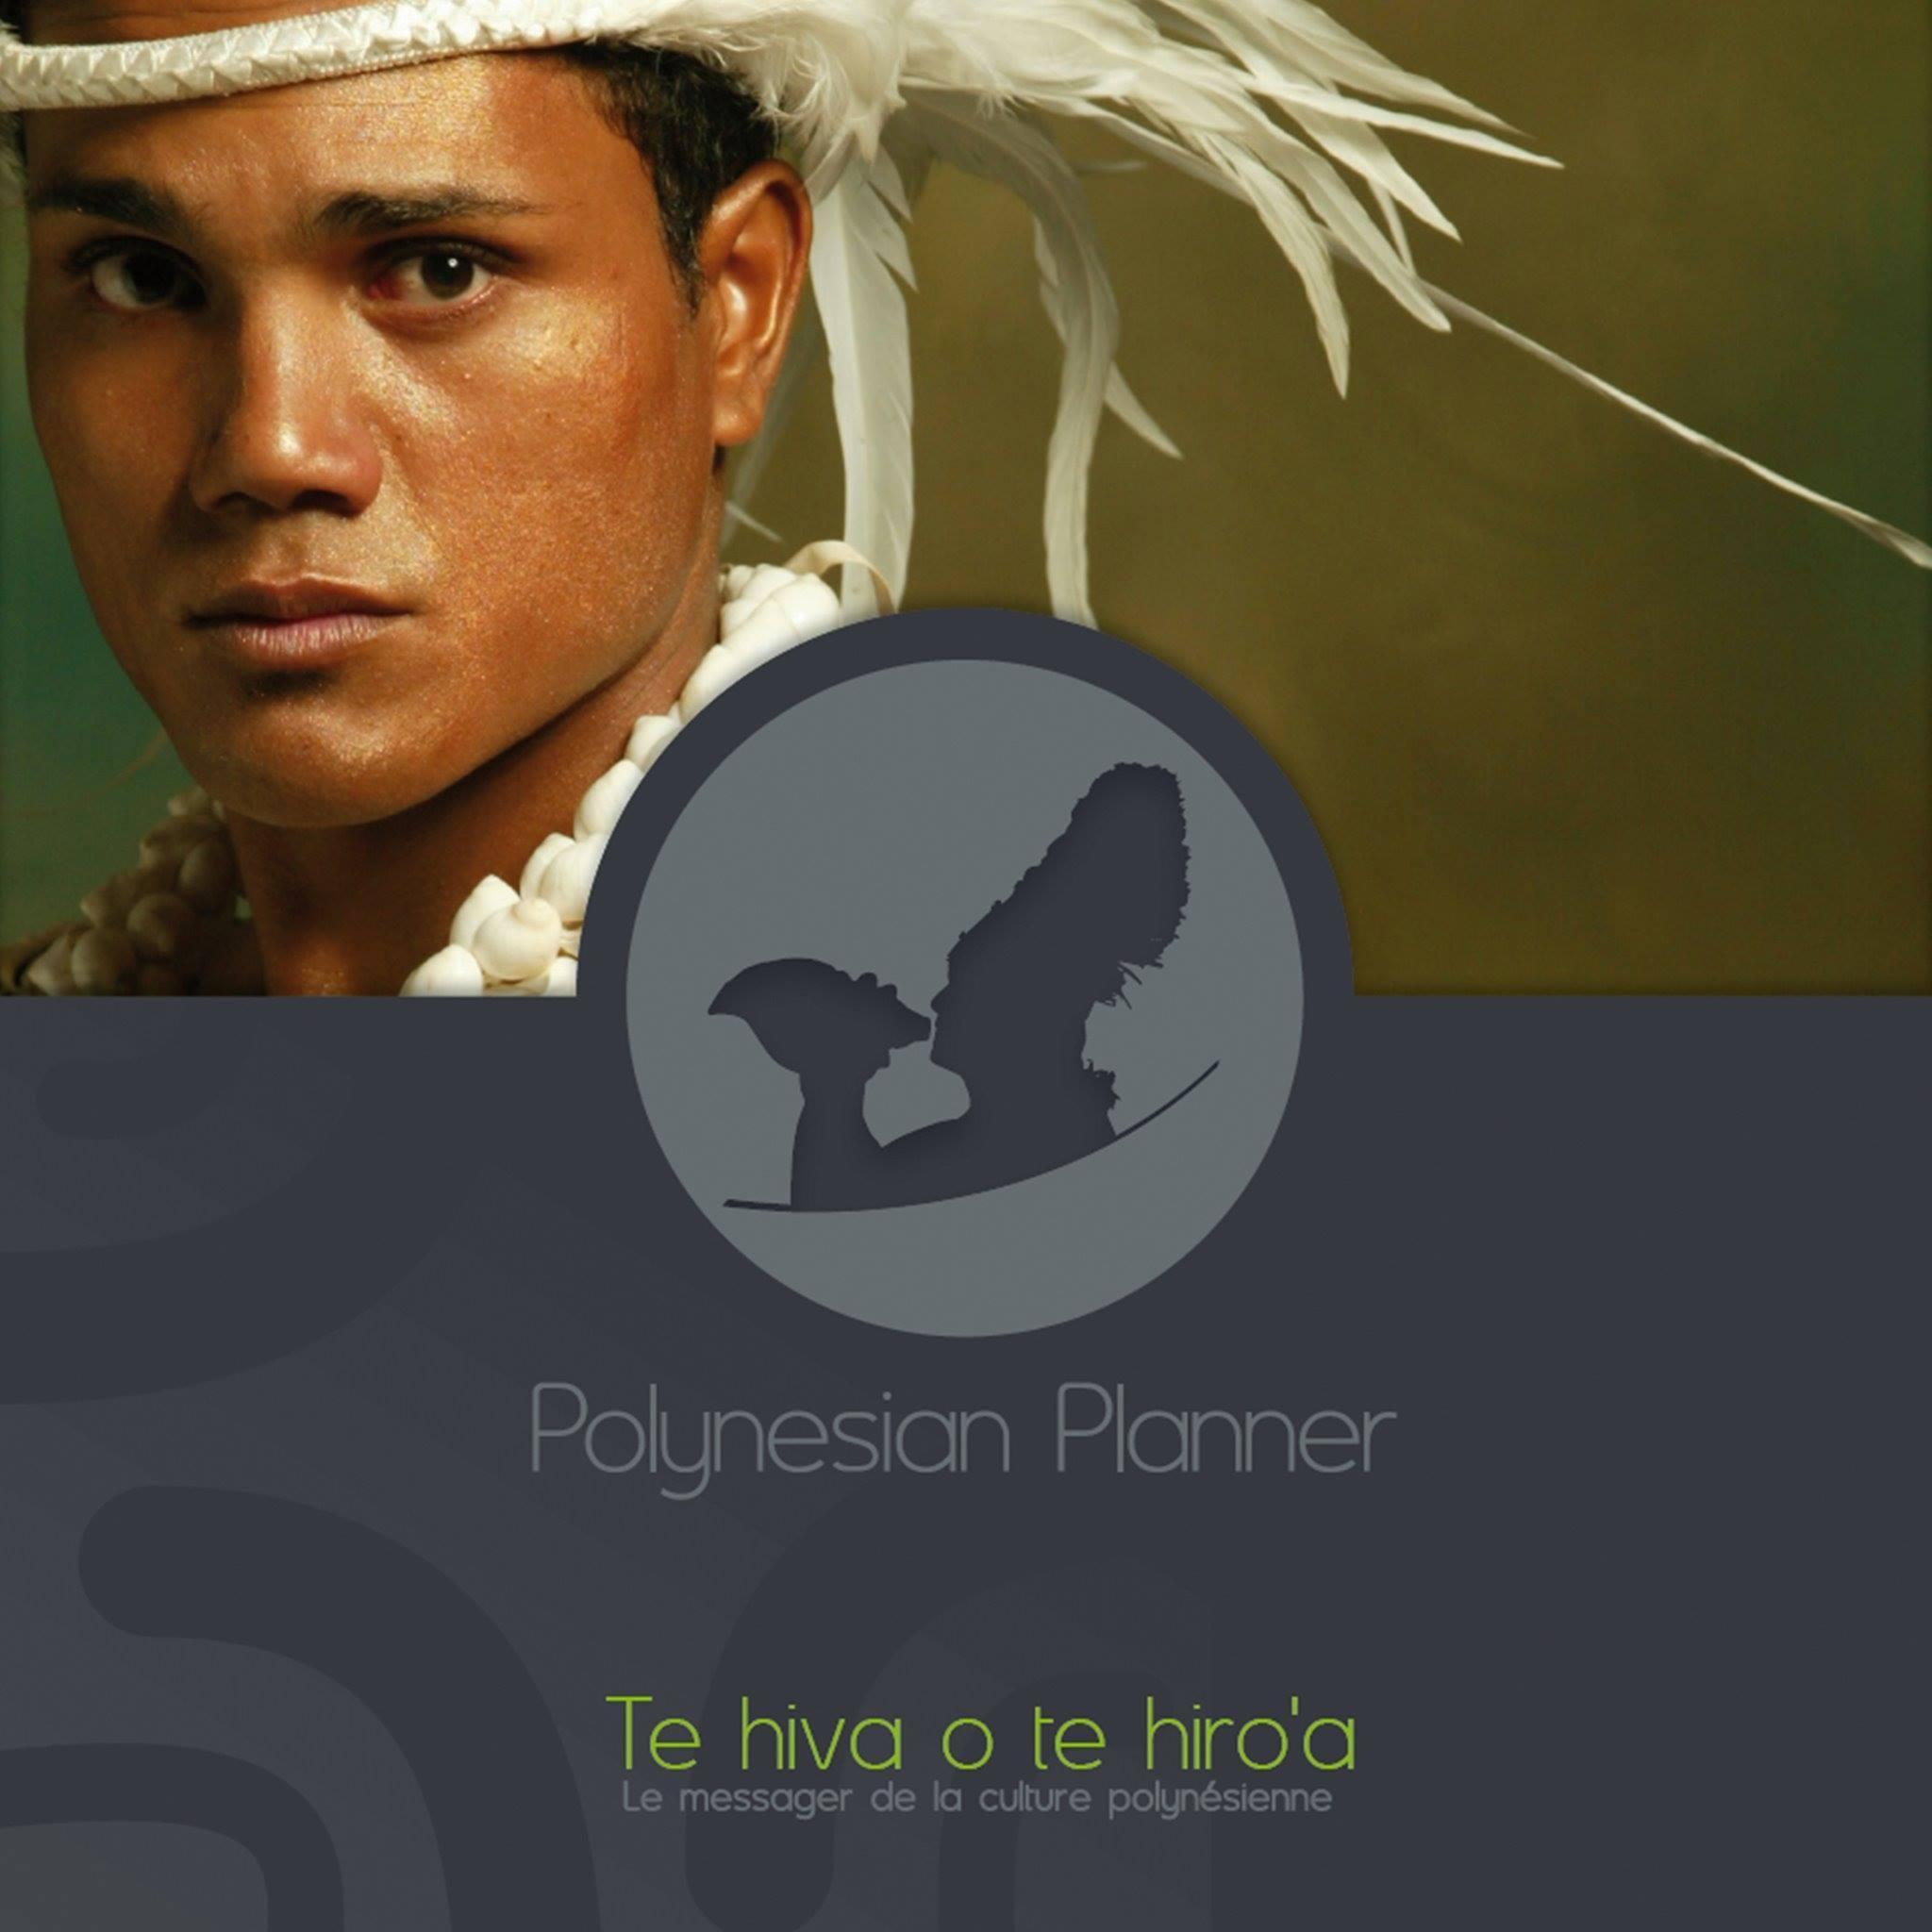 https://tahititourisme.ch/wp-content/uploads/2017/08/polynesianplannerphotodeprofil.jpg